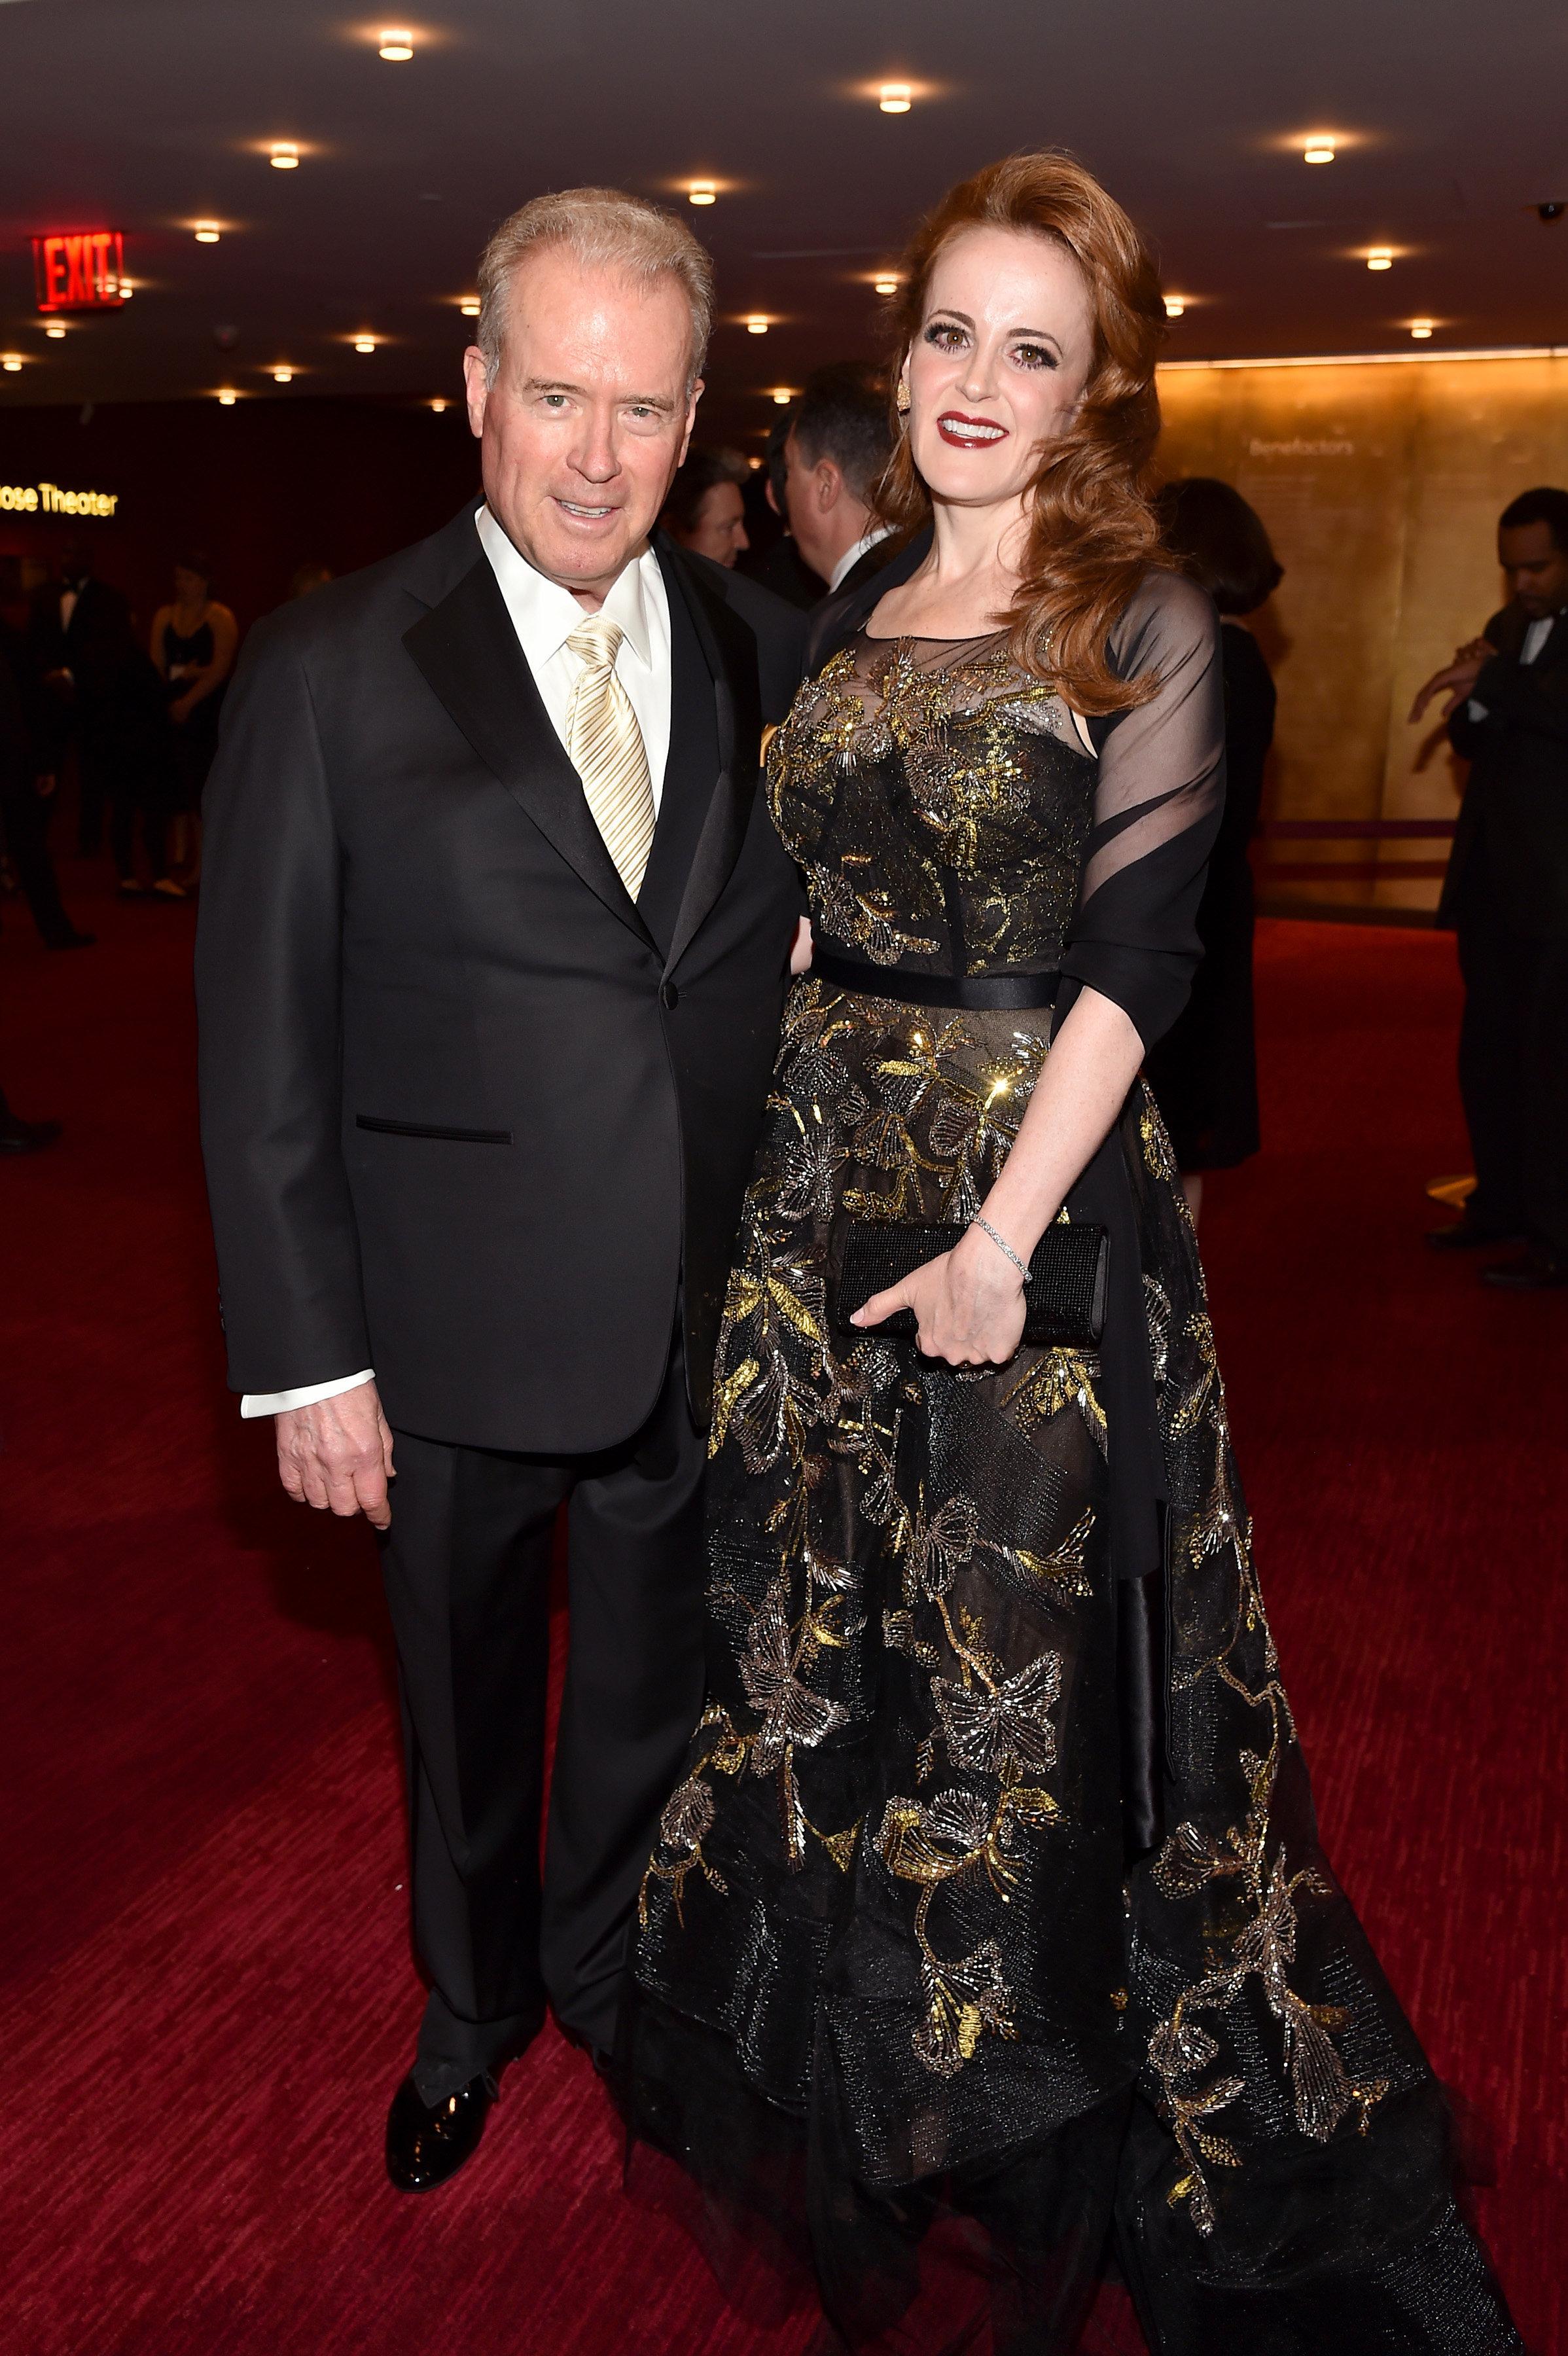 Billionaires Robert Mercer and his daughter Rebekah Mercer.